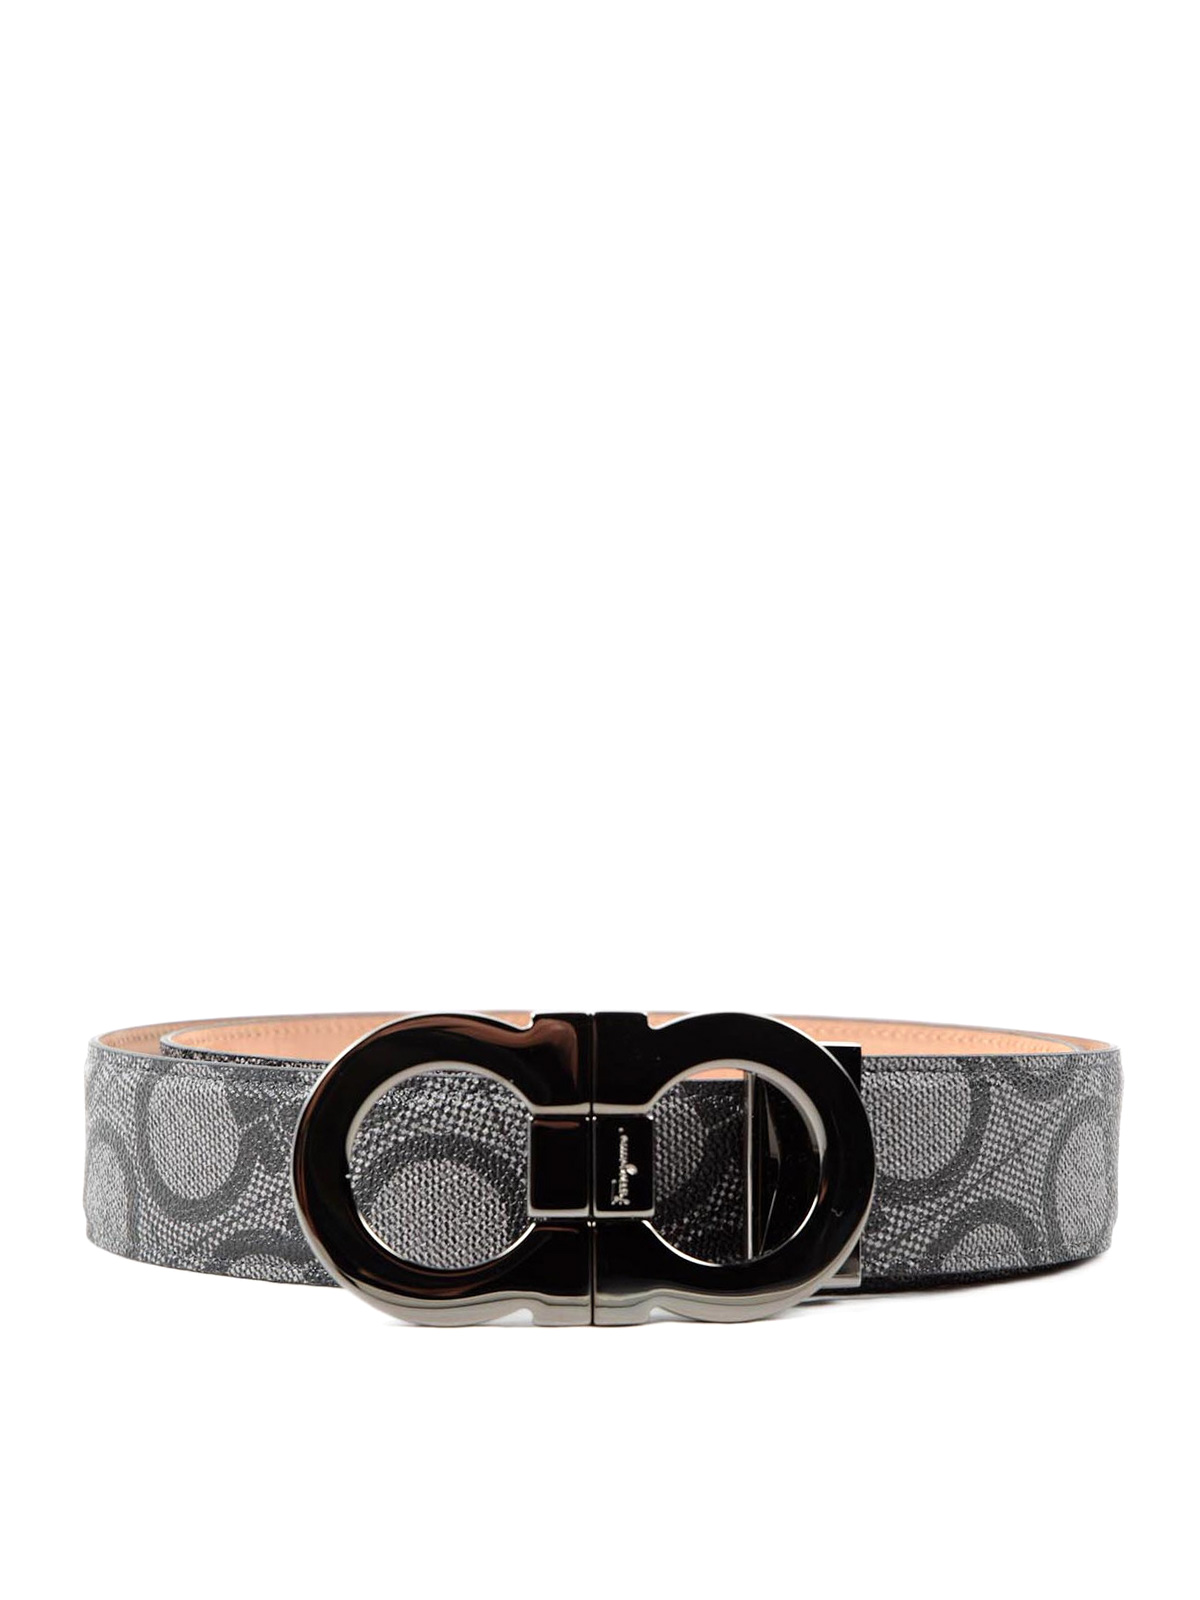 gancio print leather belt by salvatore ferragamo